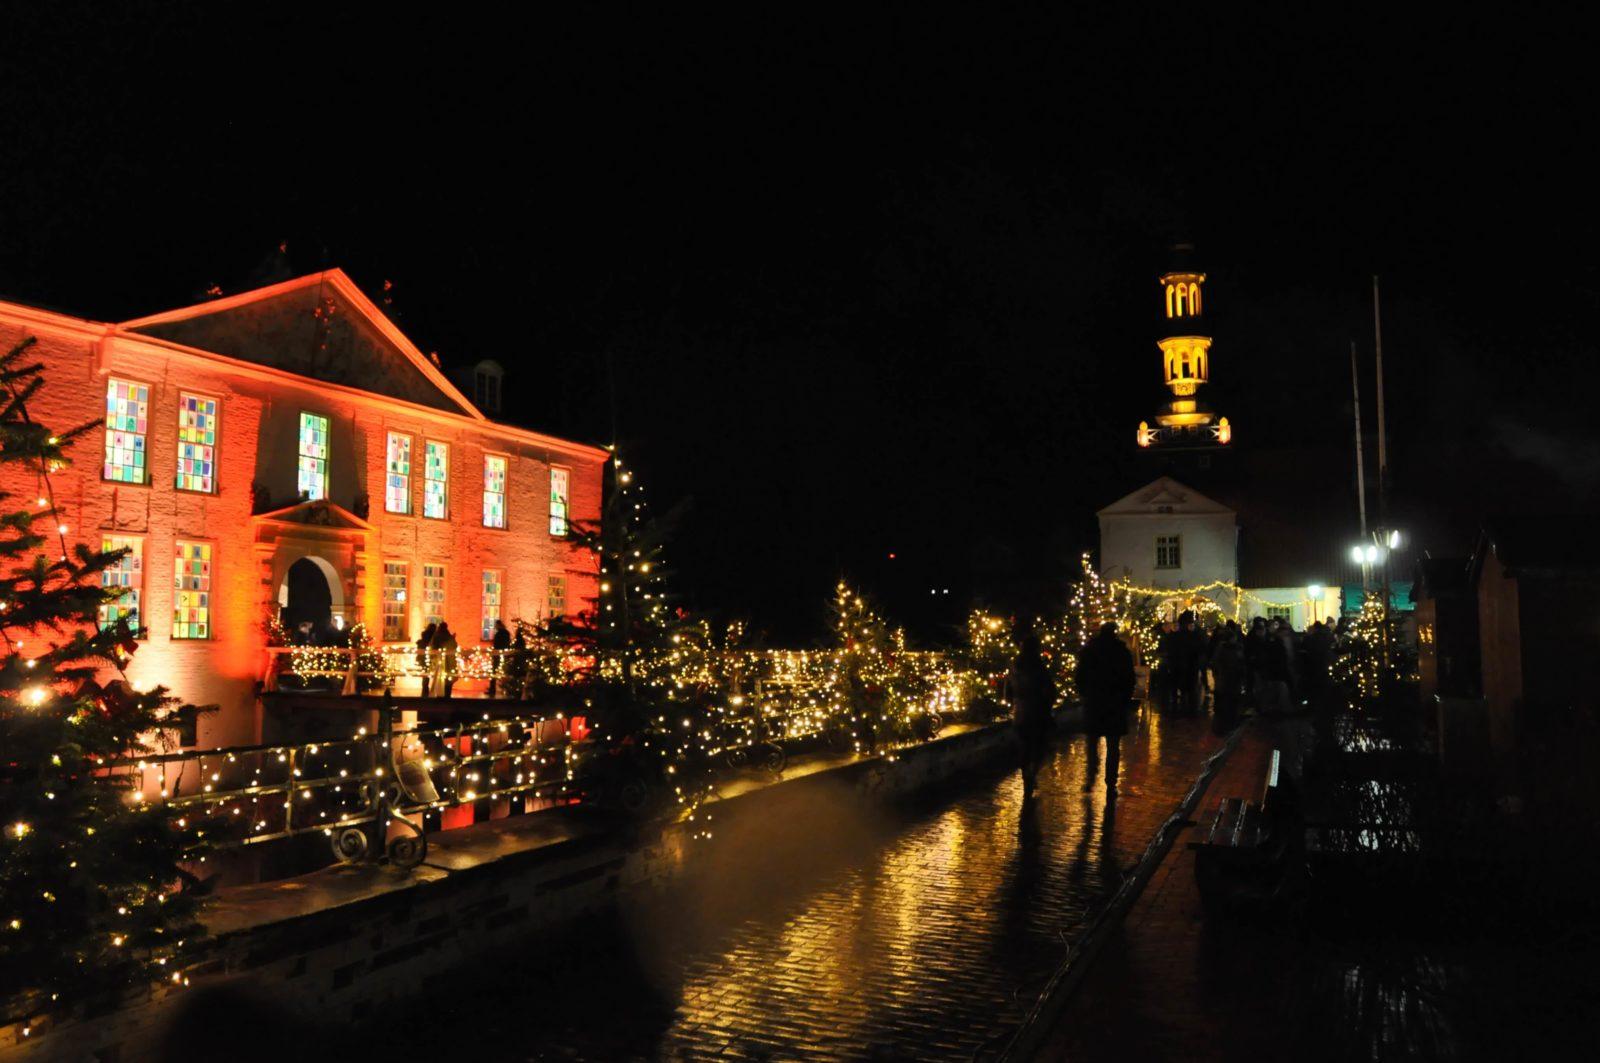 Wasserschloss Dornum im Winter